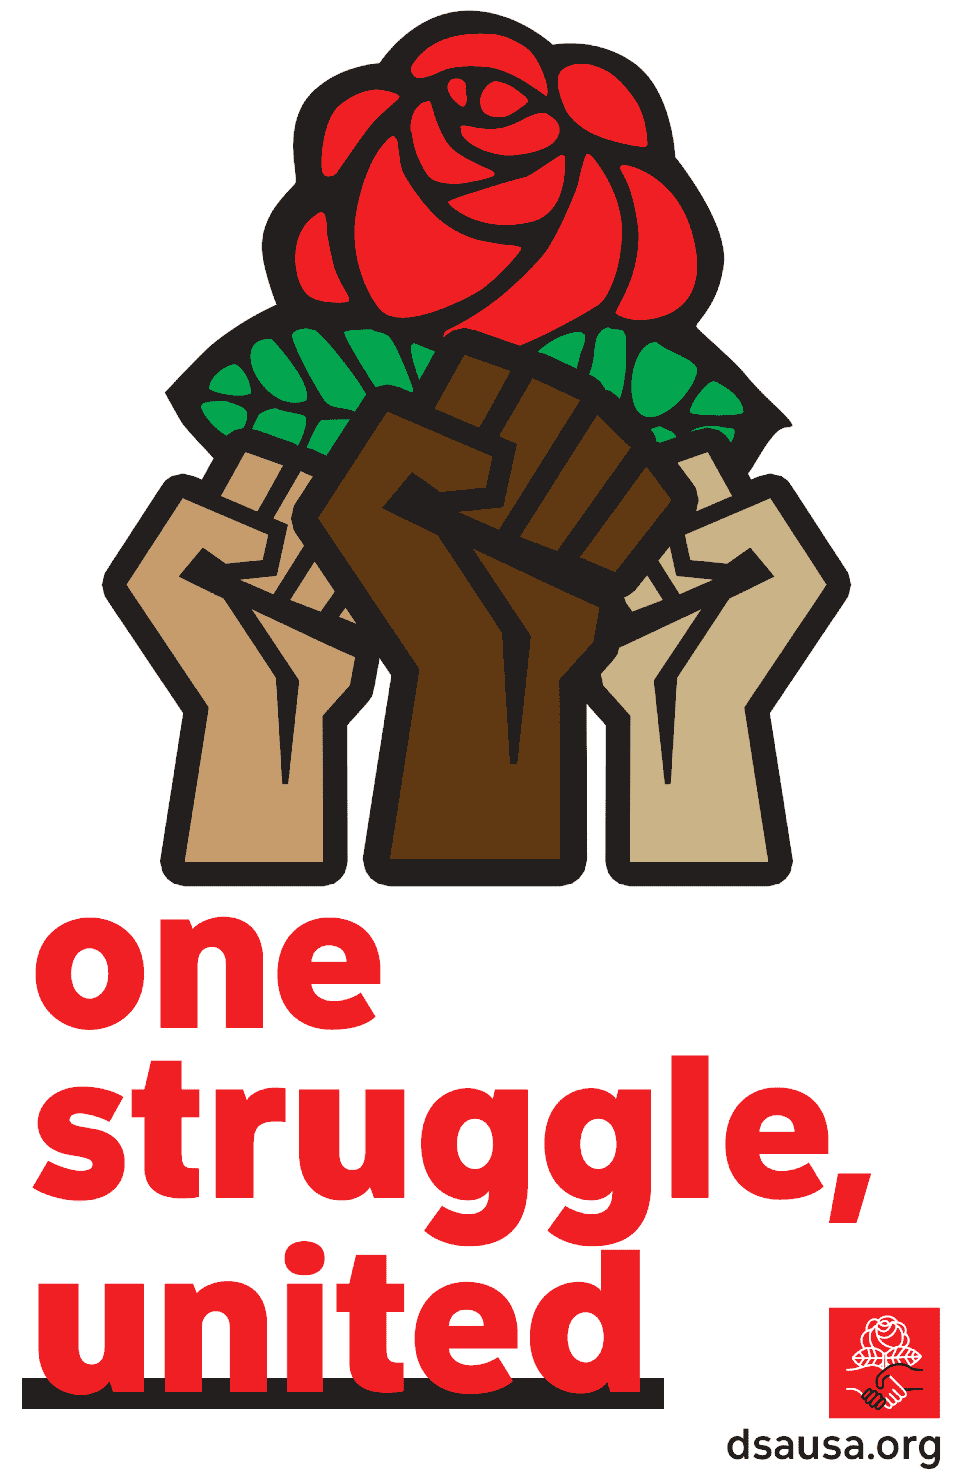 one struggle